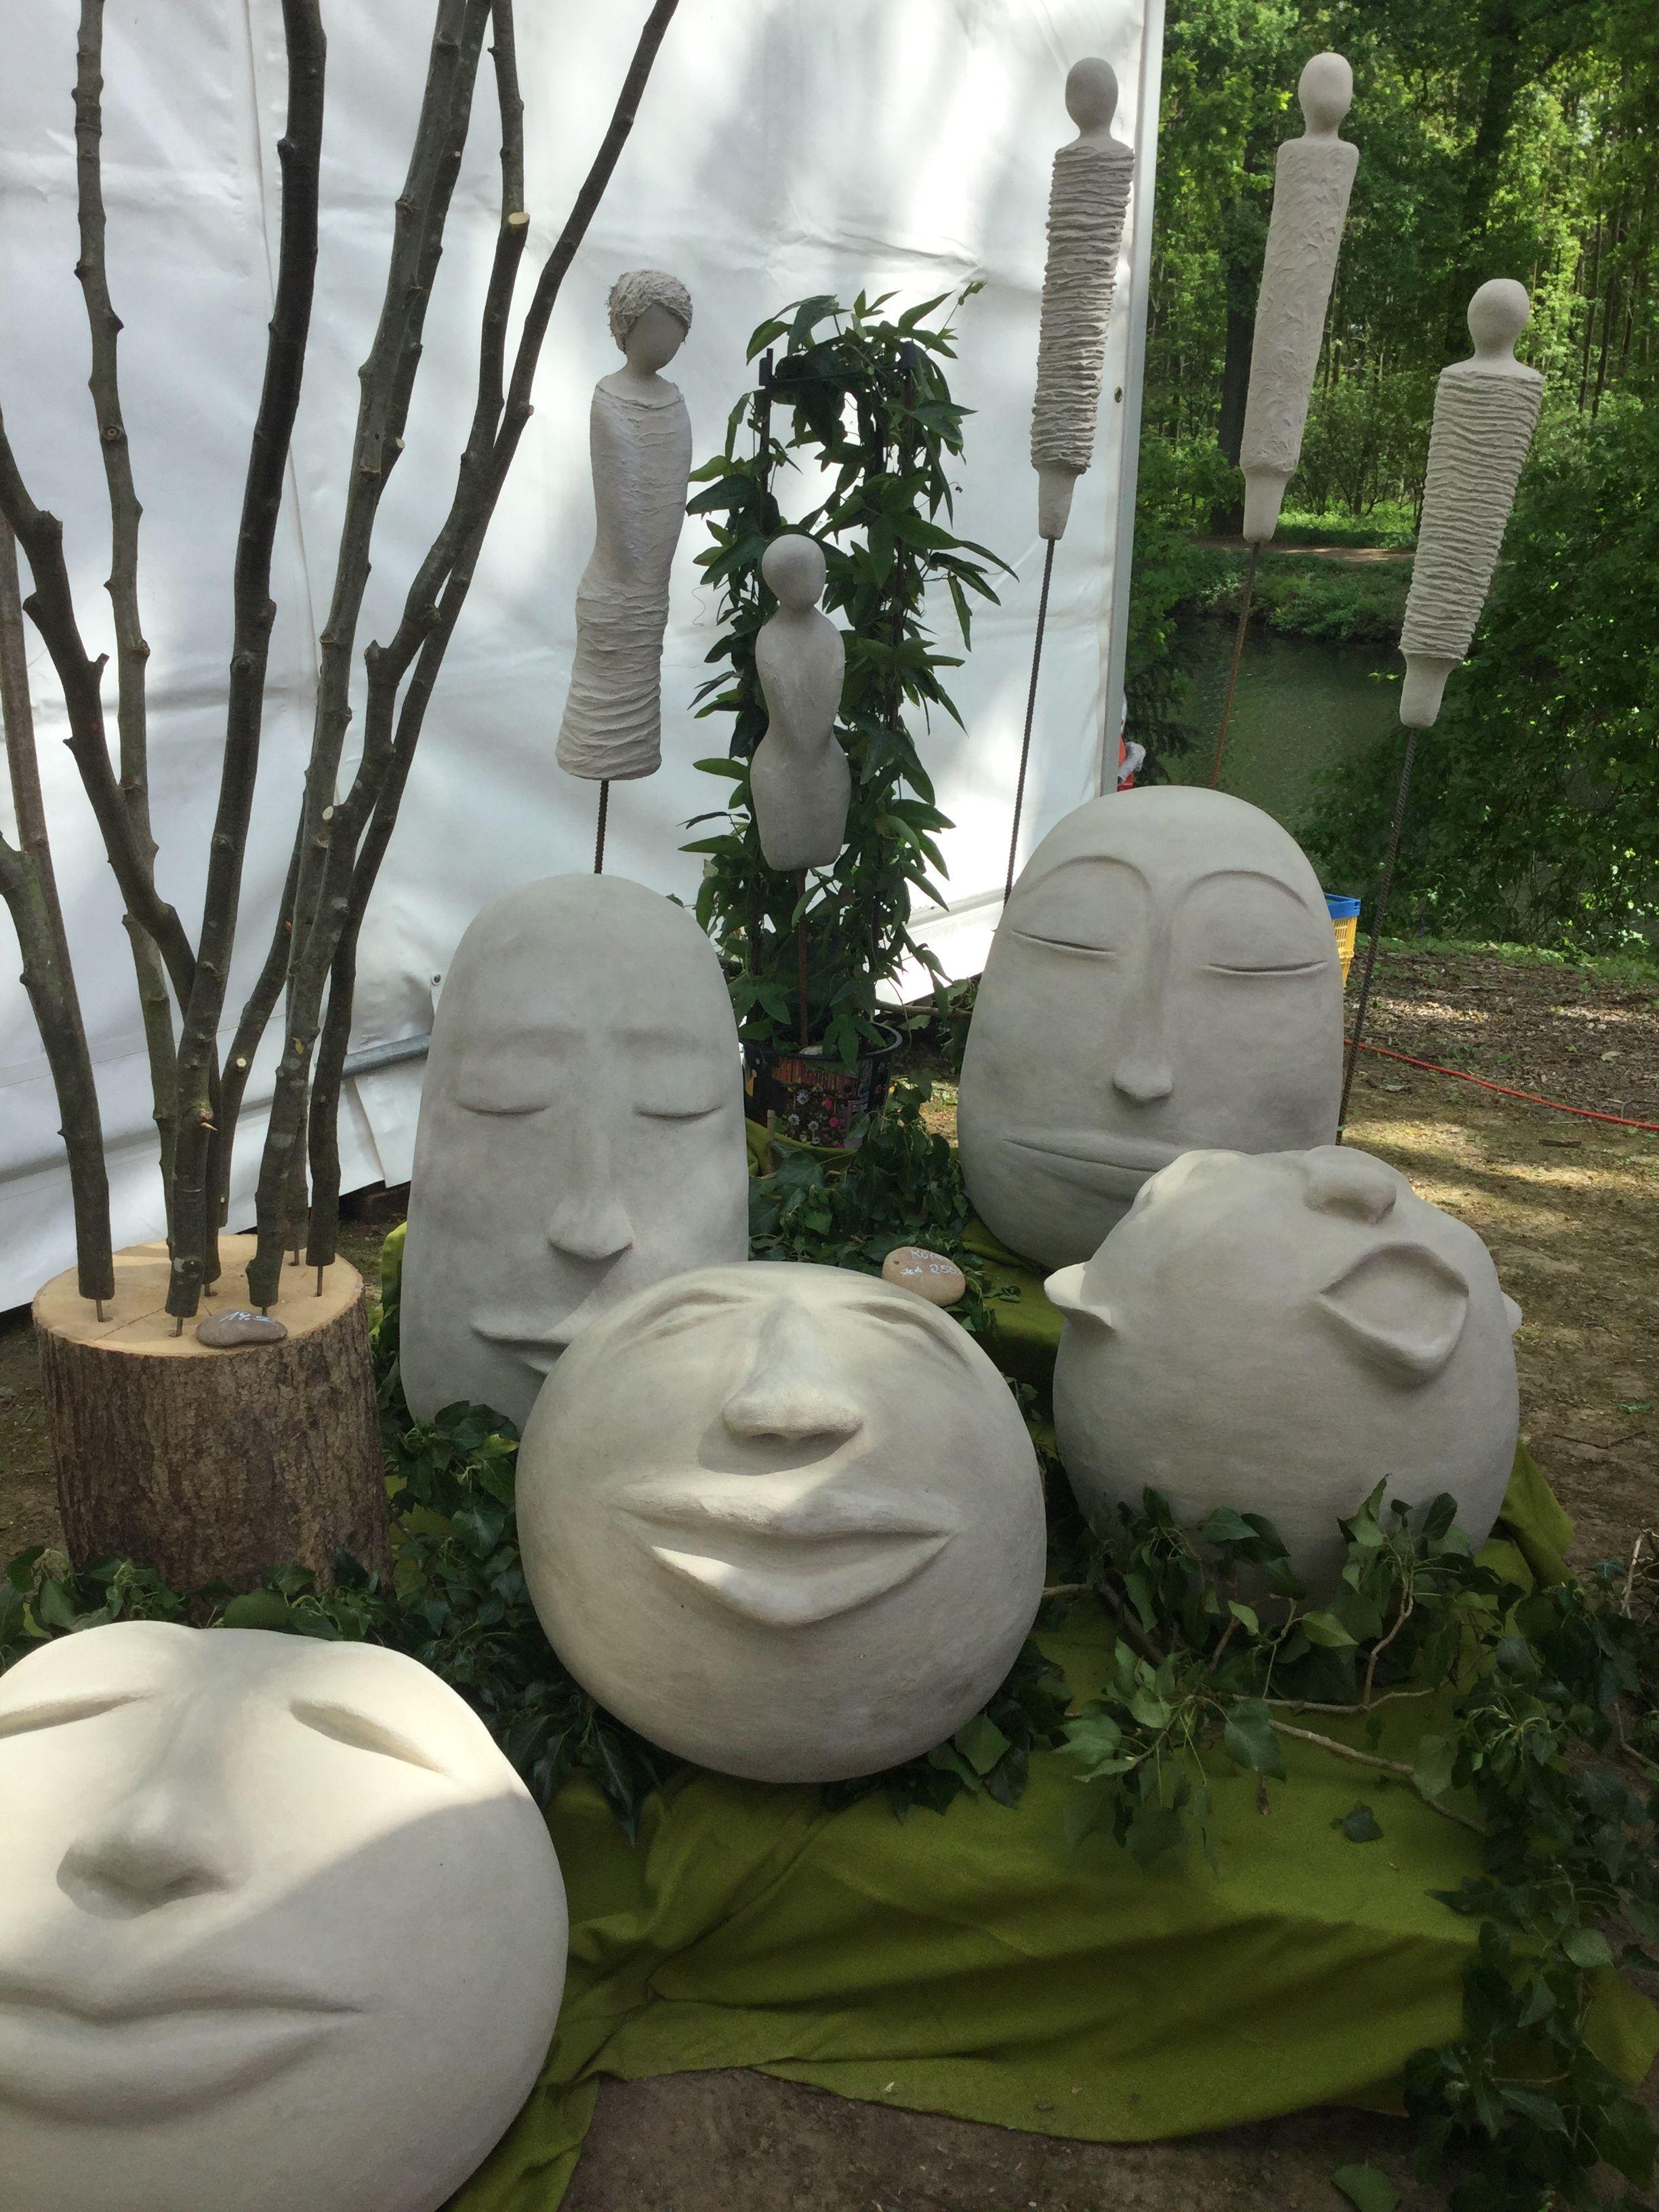 Pin Von Carmen Schlieker Auf Betonskulpturen Beton Kreativ Gestalten Skulptur Skulpturen Skulpturen Garten Kunst Skulpturen